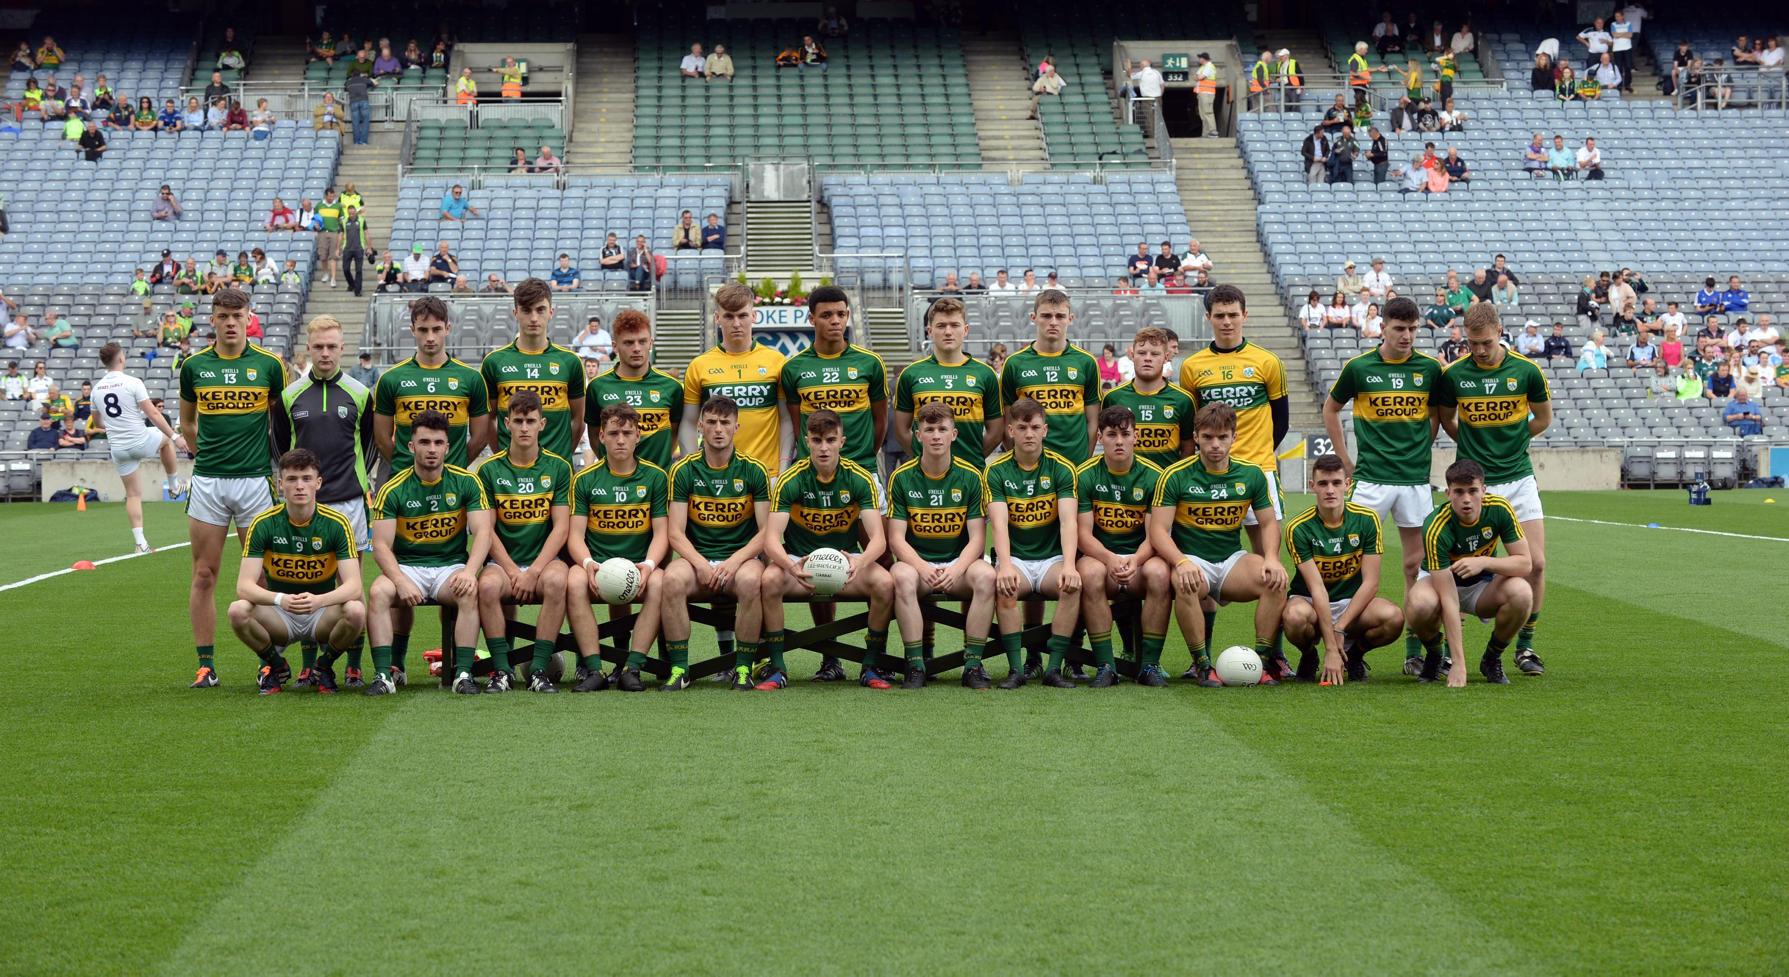 The Kerry Minor team in the Kerry V Kildare Minor All-Ireland Semi-Final in Croke Park on Sunday. PICTURE: DON MACMONAGLE, MACMONAGLE.COM